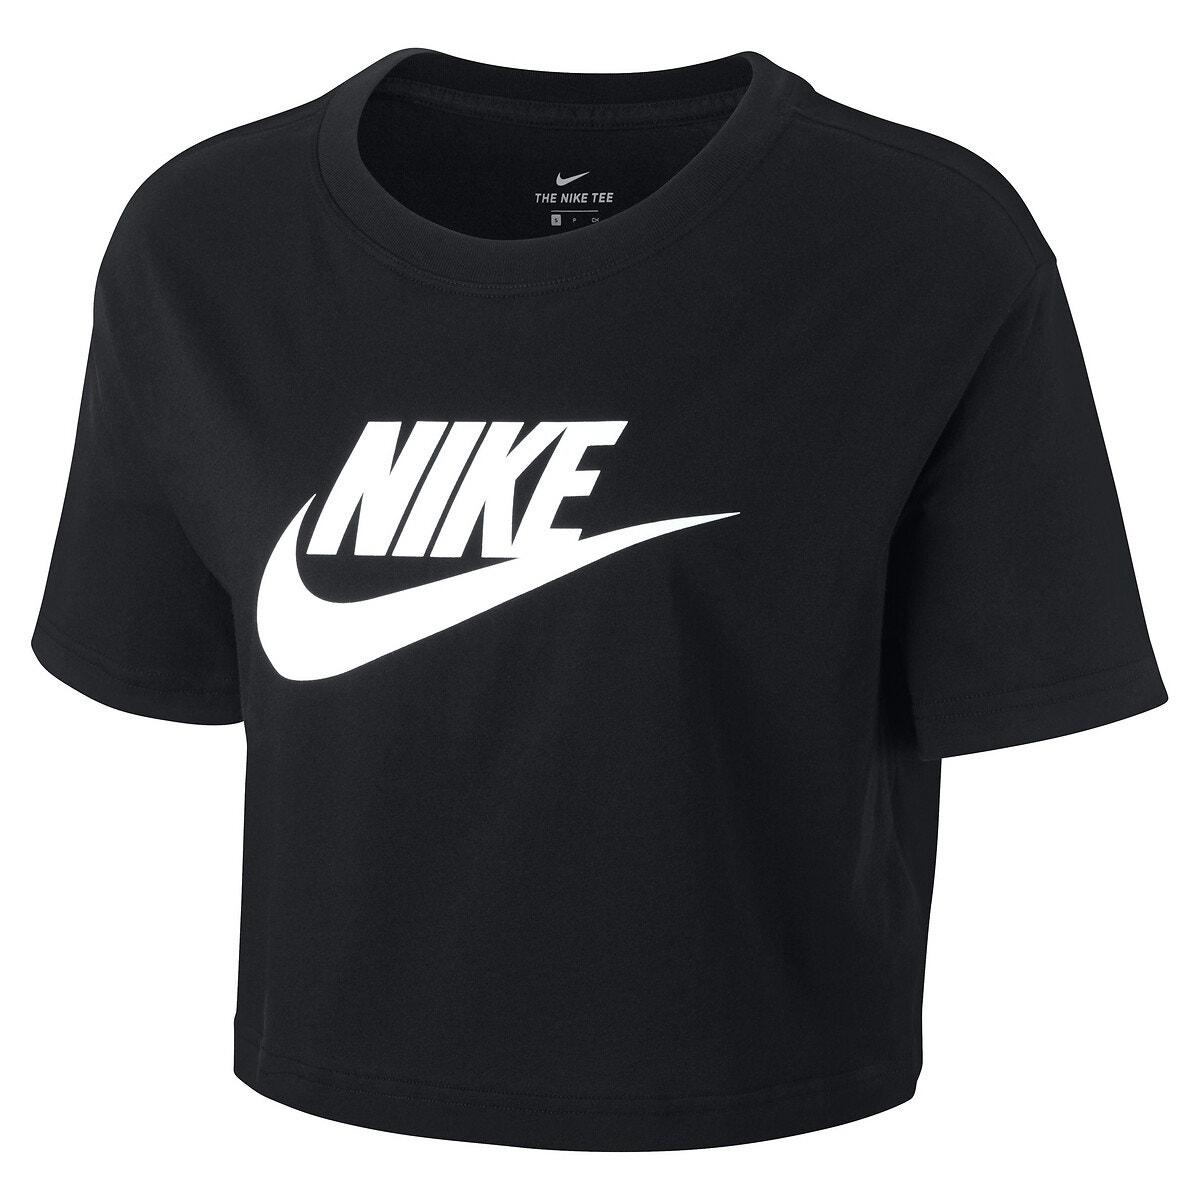 NIKE - Nike T-shirt curta Essential logo